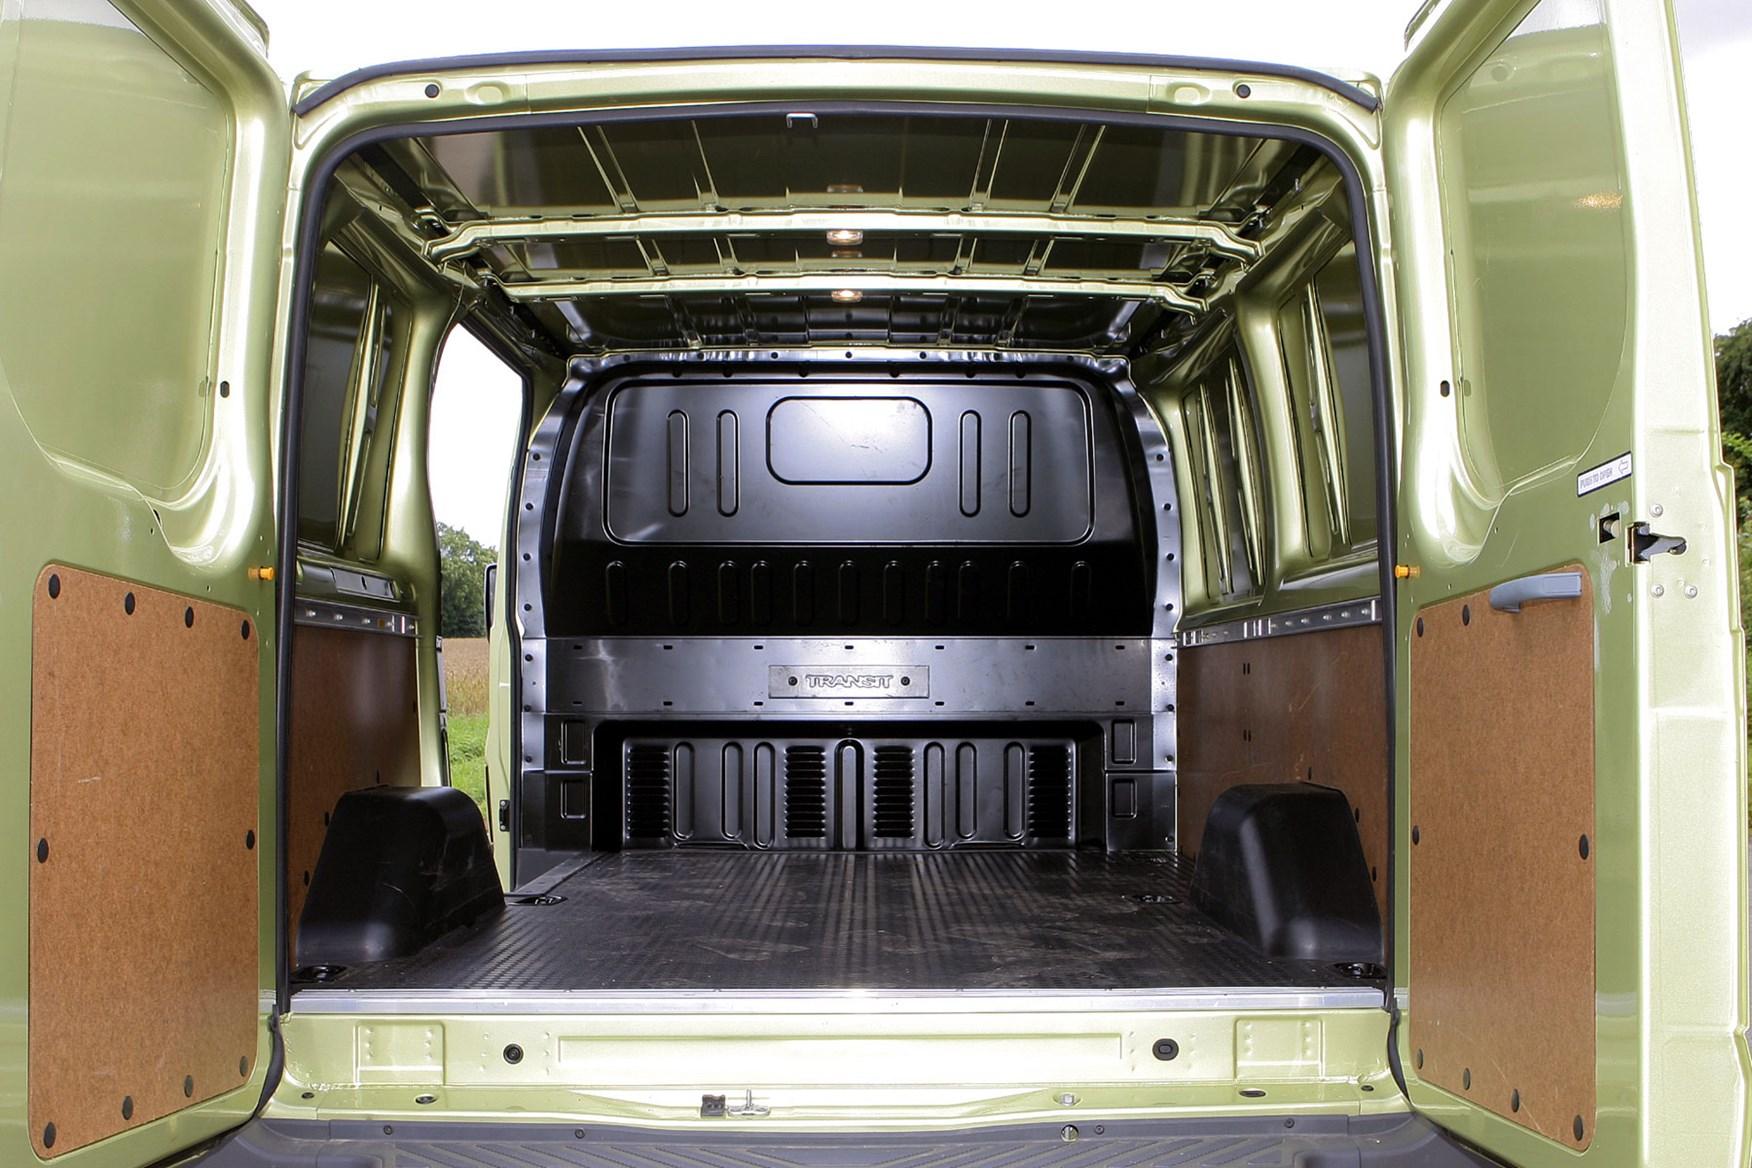 Ford Transit (2006-2014) load capacity